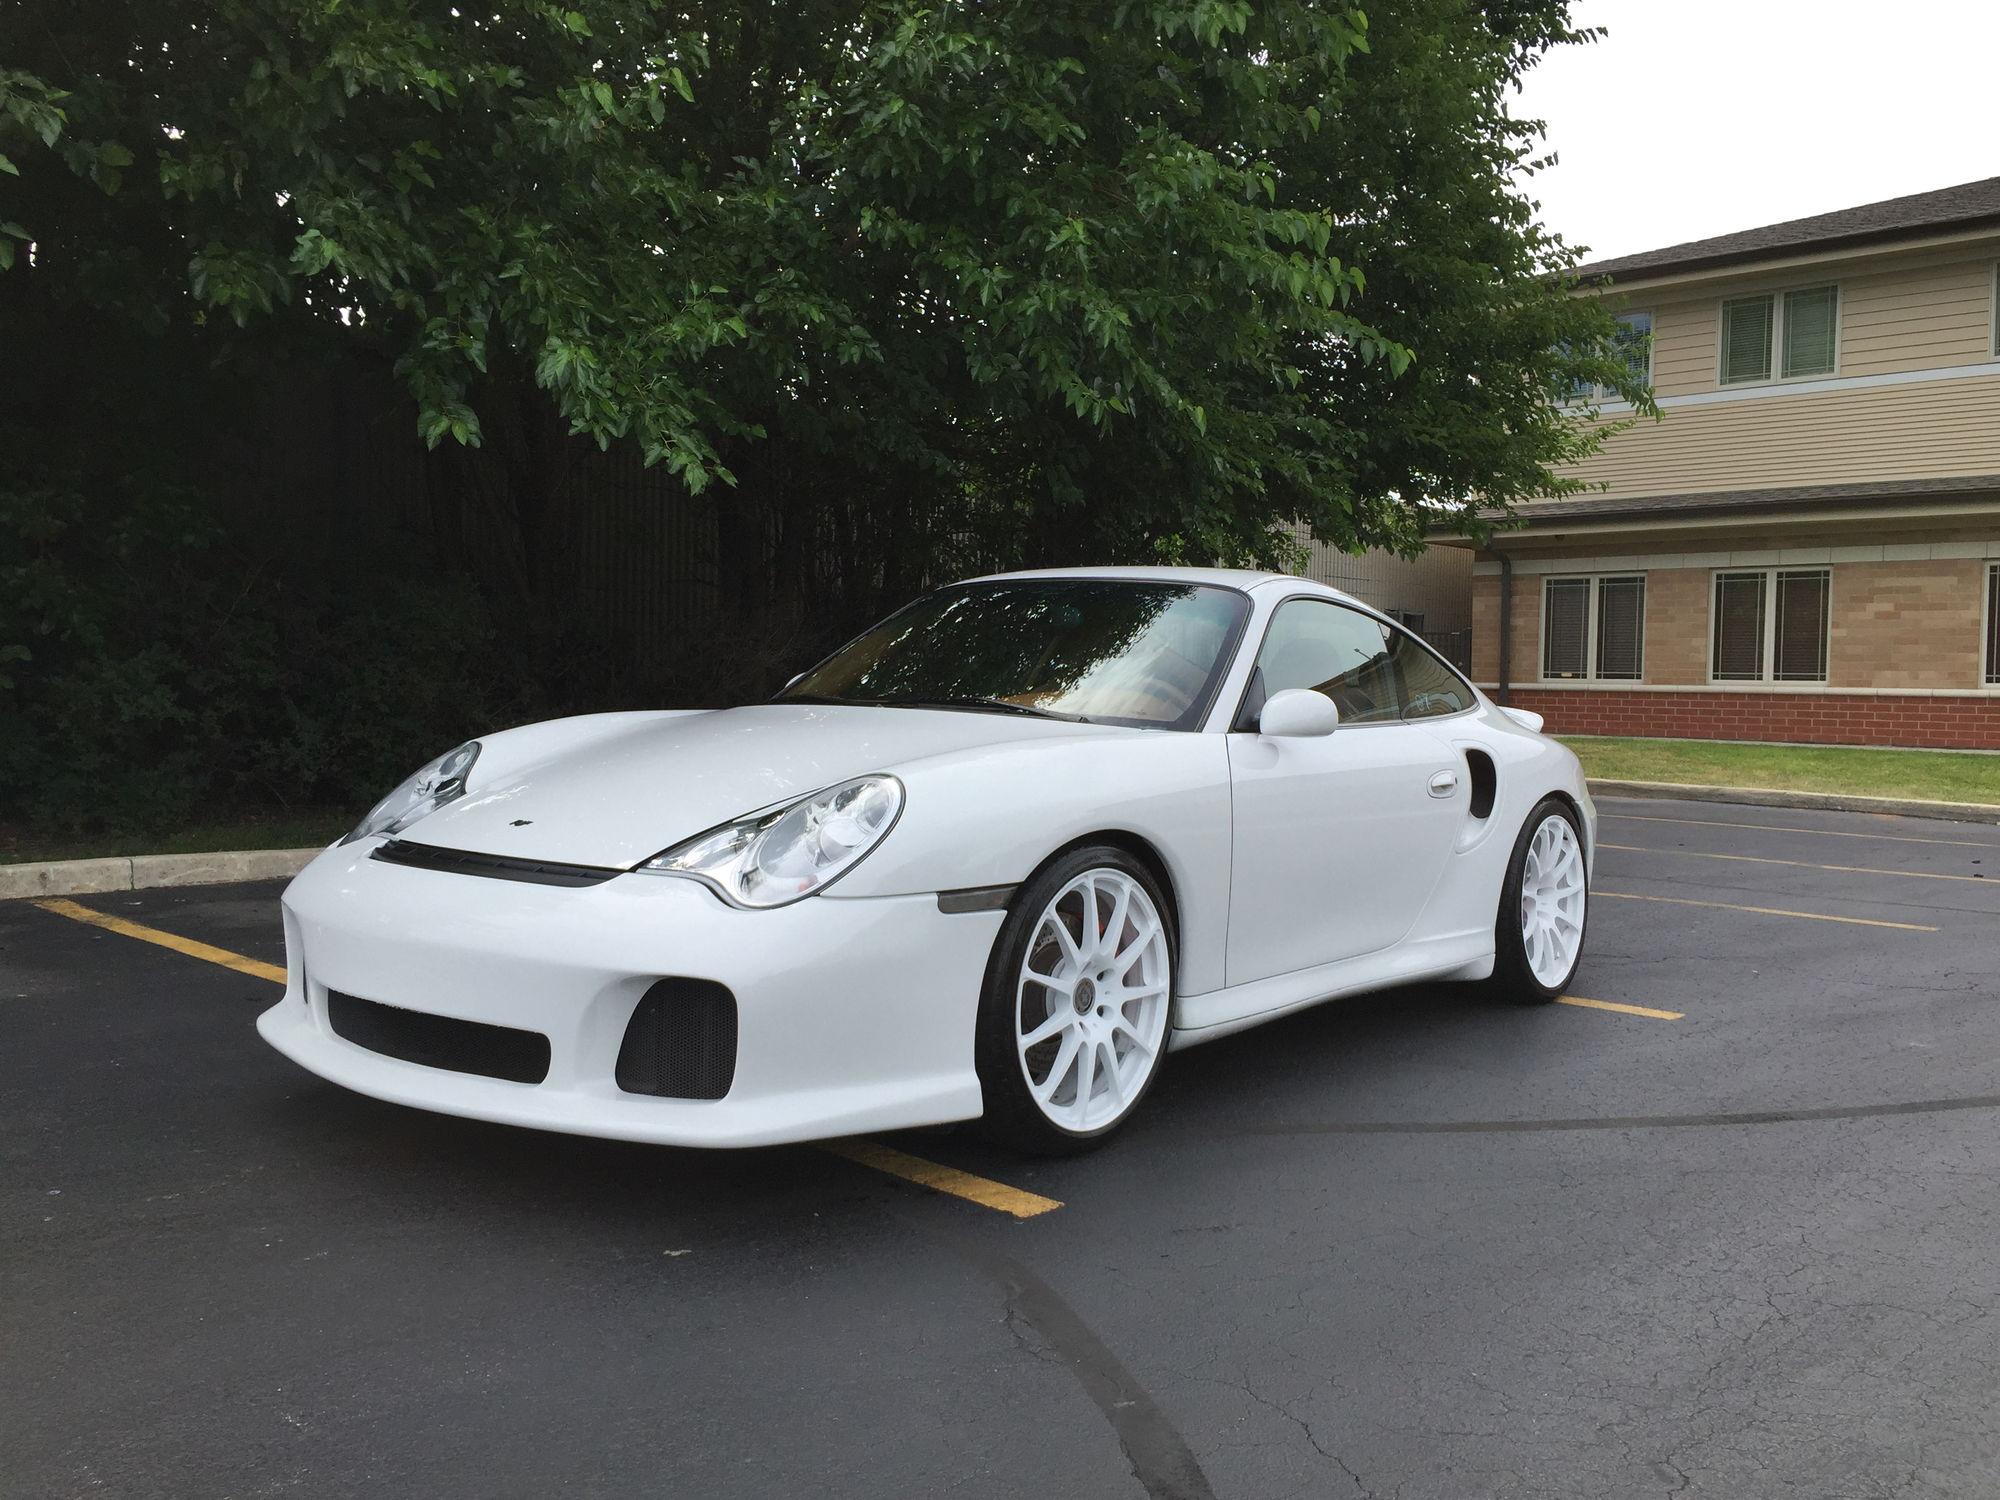 80-img_5044_872711012bba12ed68a3962c83458b3e92ed97a8 Terrific 2002 Porsche 911 Carrera Turbo Gt2 X50 Cars Trend